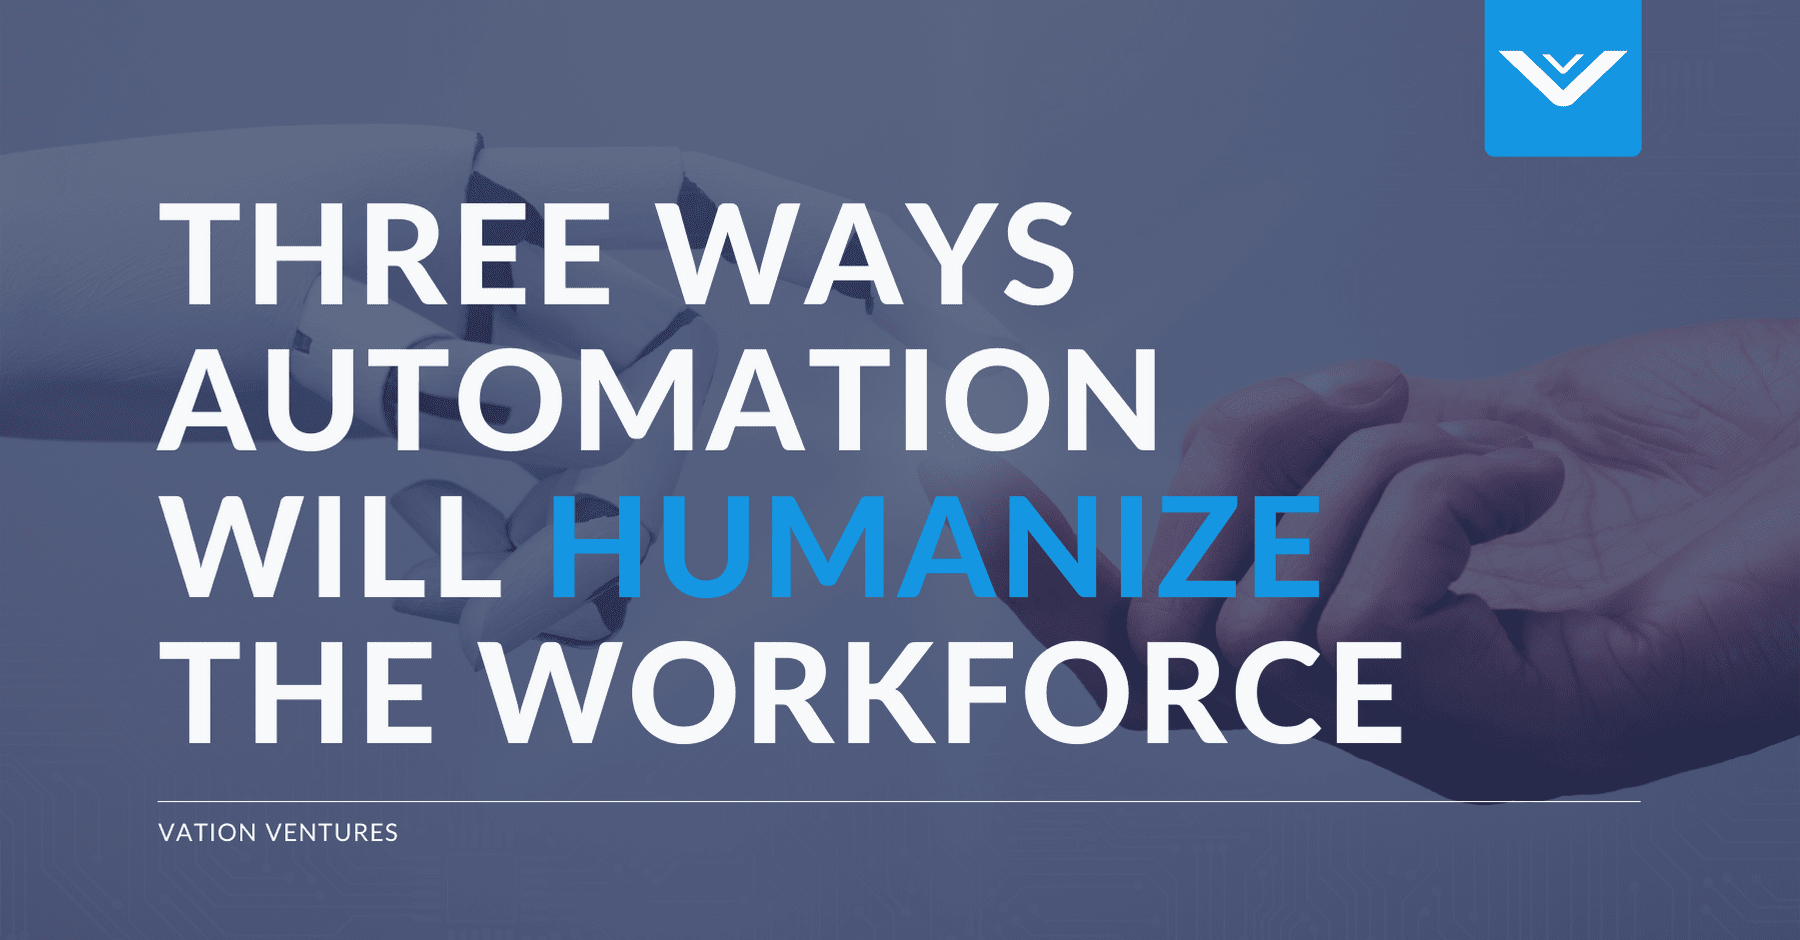 Three Ways Automation Will Humanize The Workforce